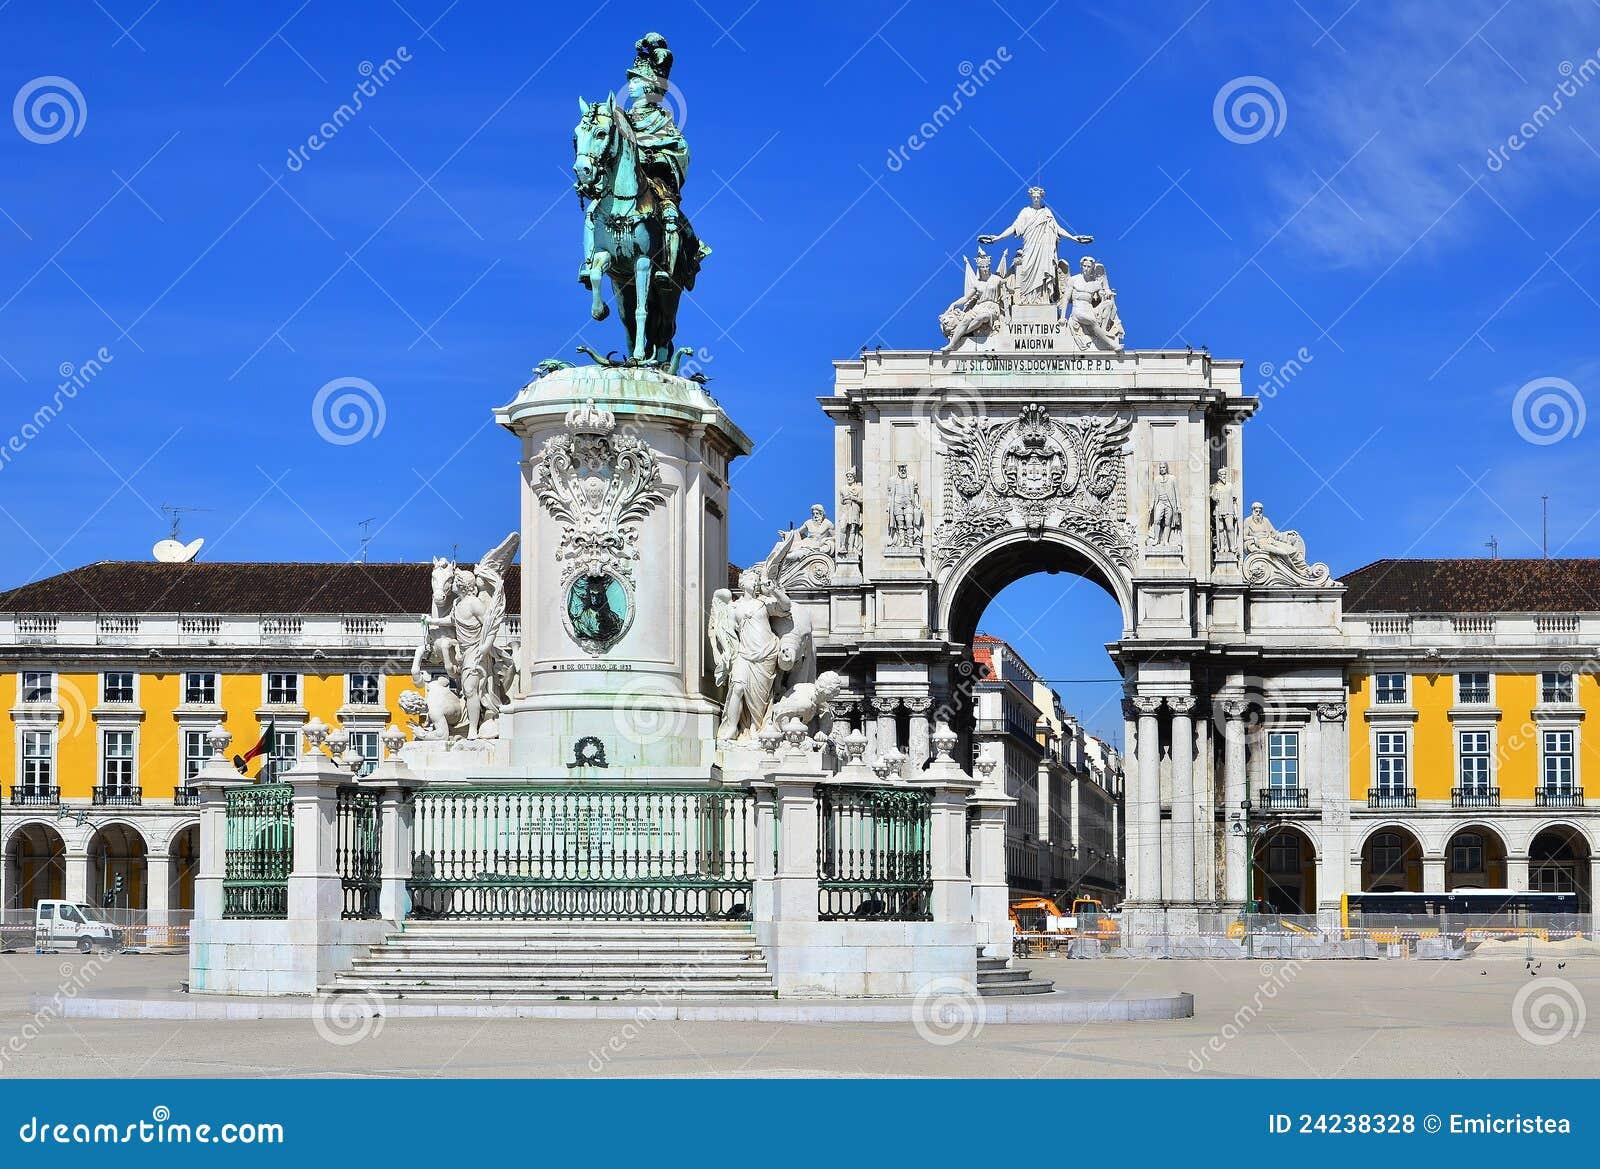 praca do comercio lisbon portugal royalty free stock photos image 24238328. Black Bedroom Furniture Sets. Home Design Ideas